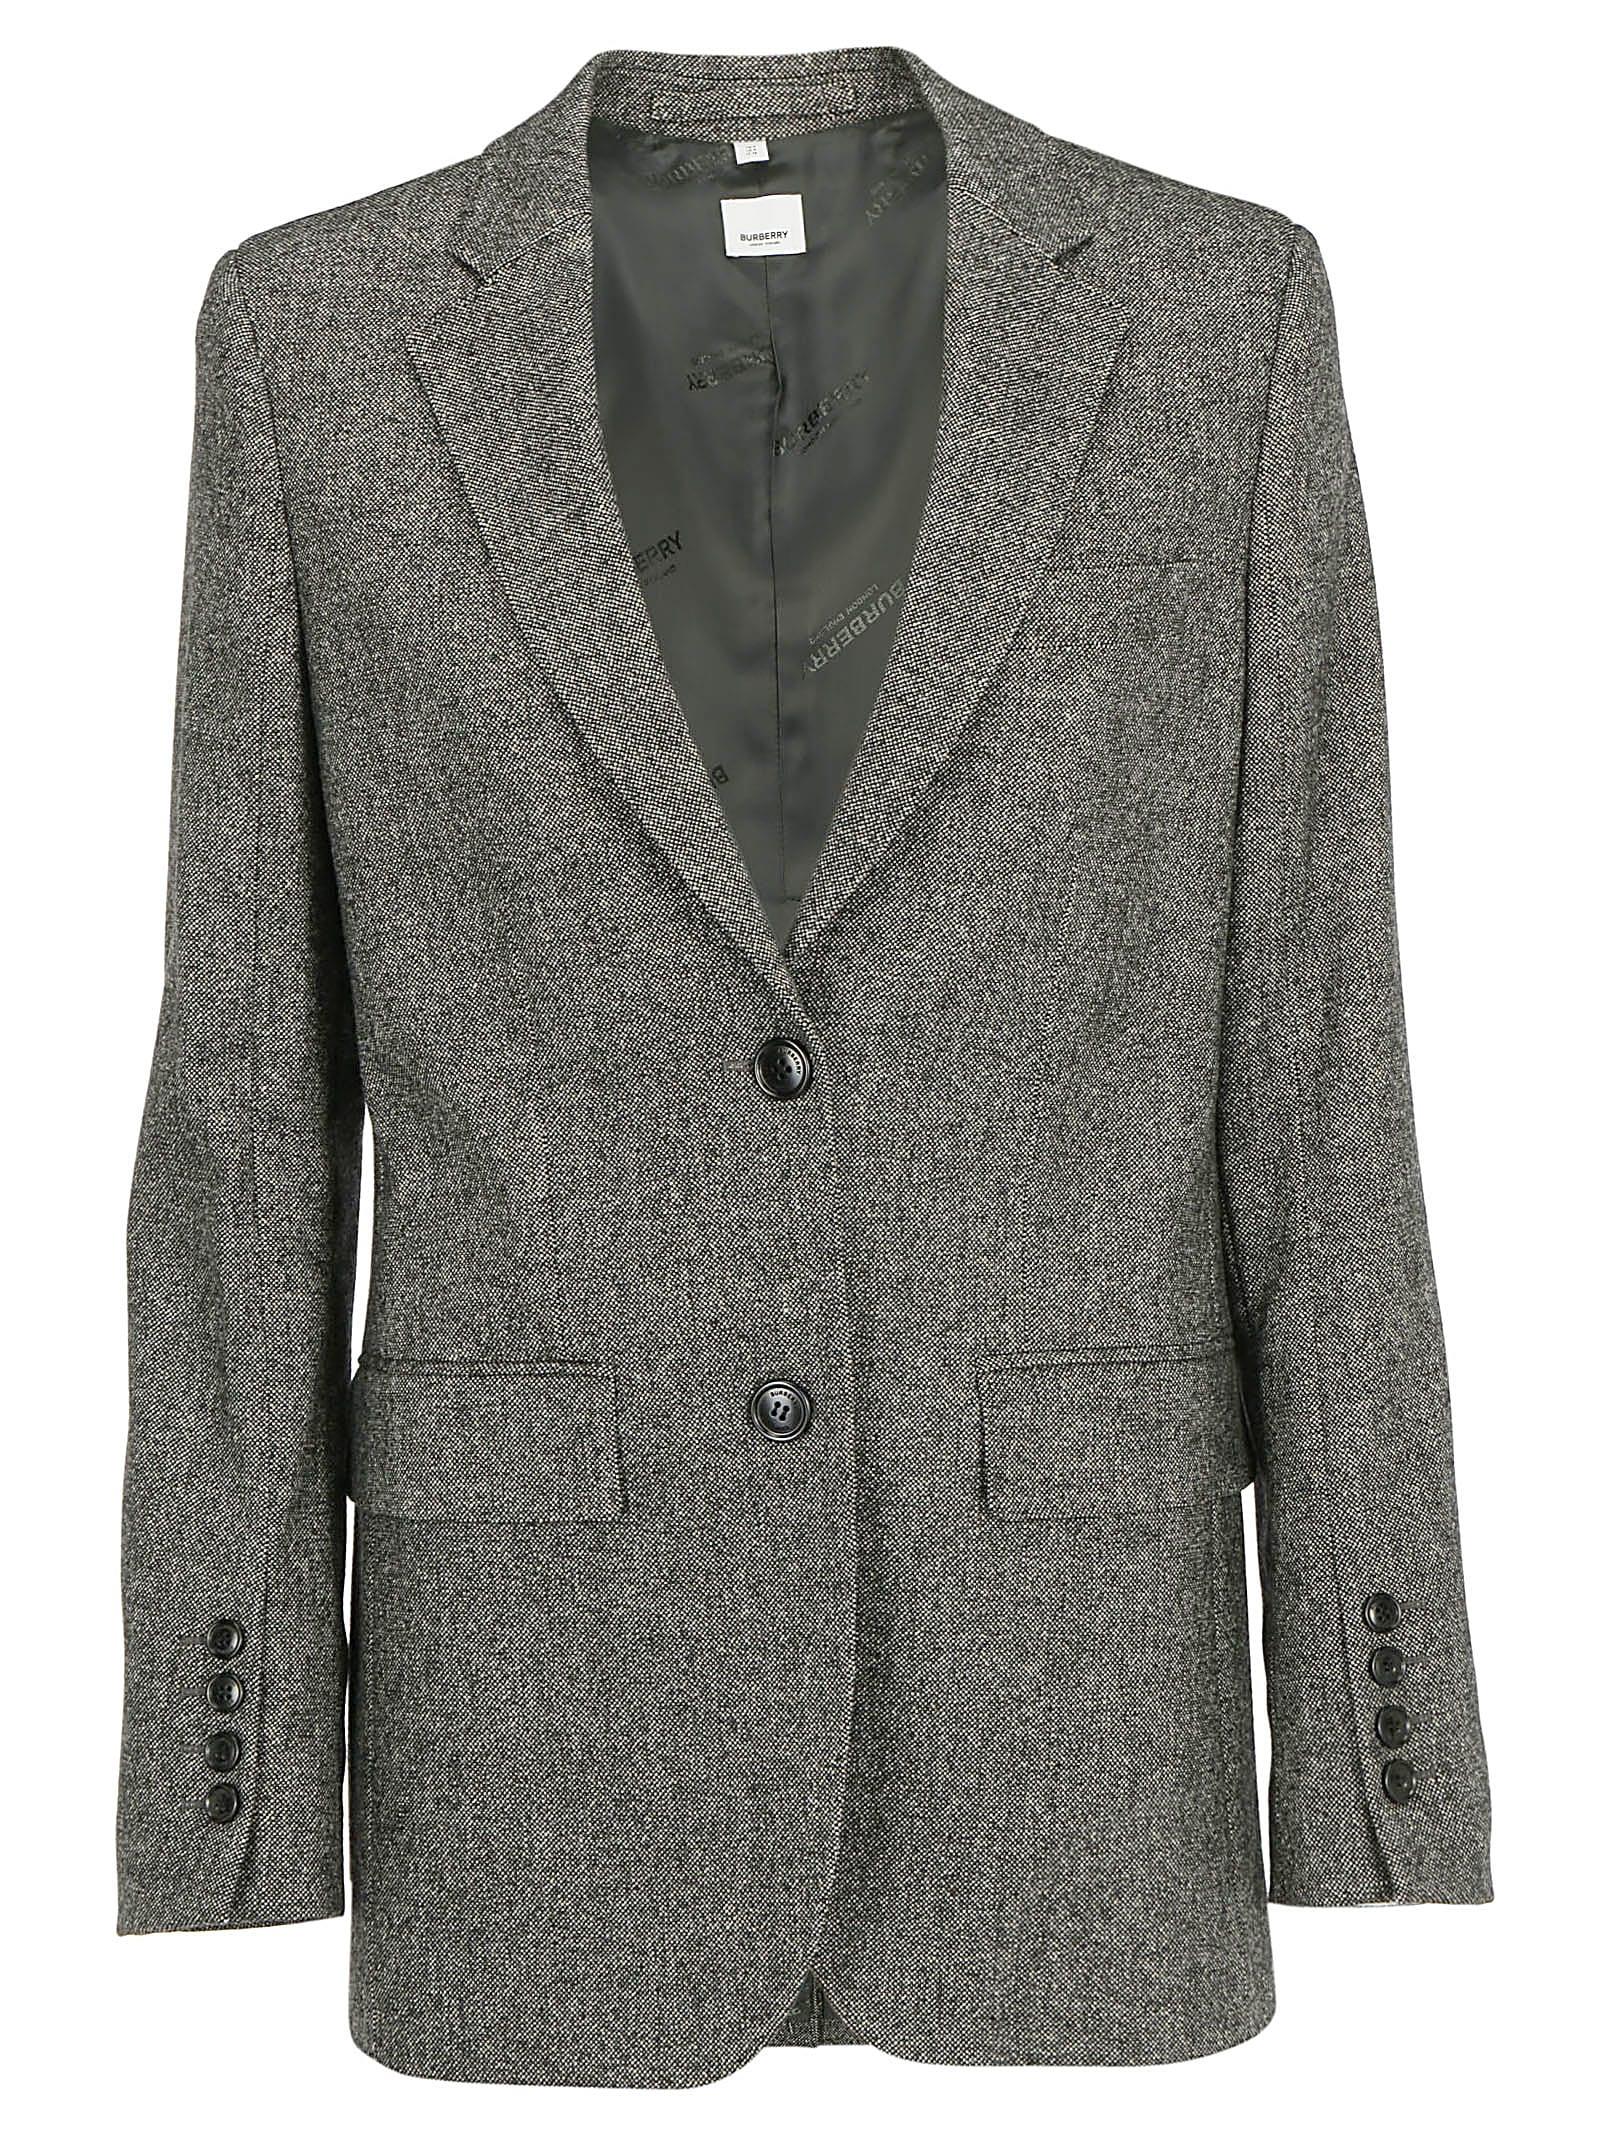 Burberry Sidon Jacket